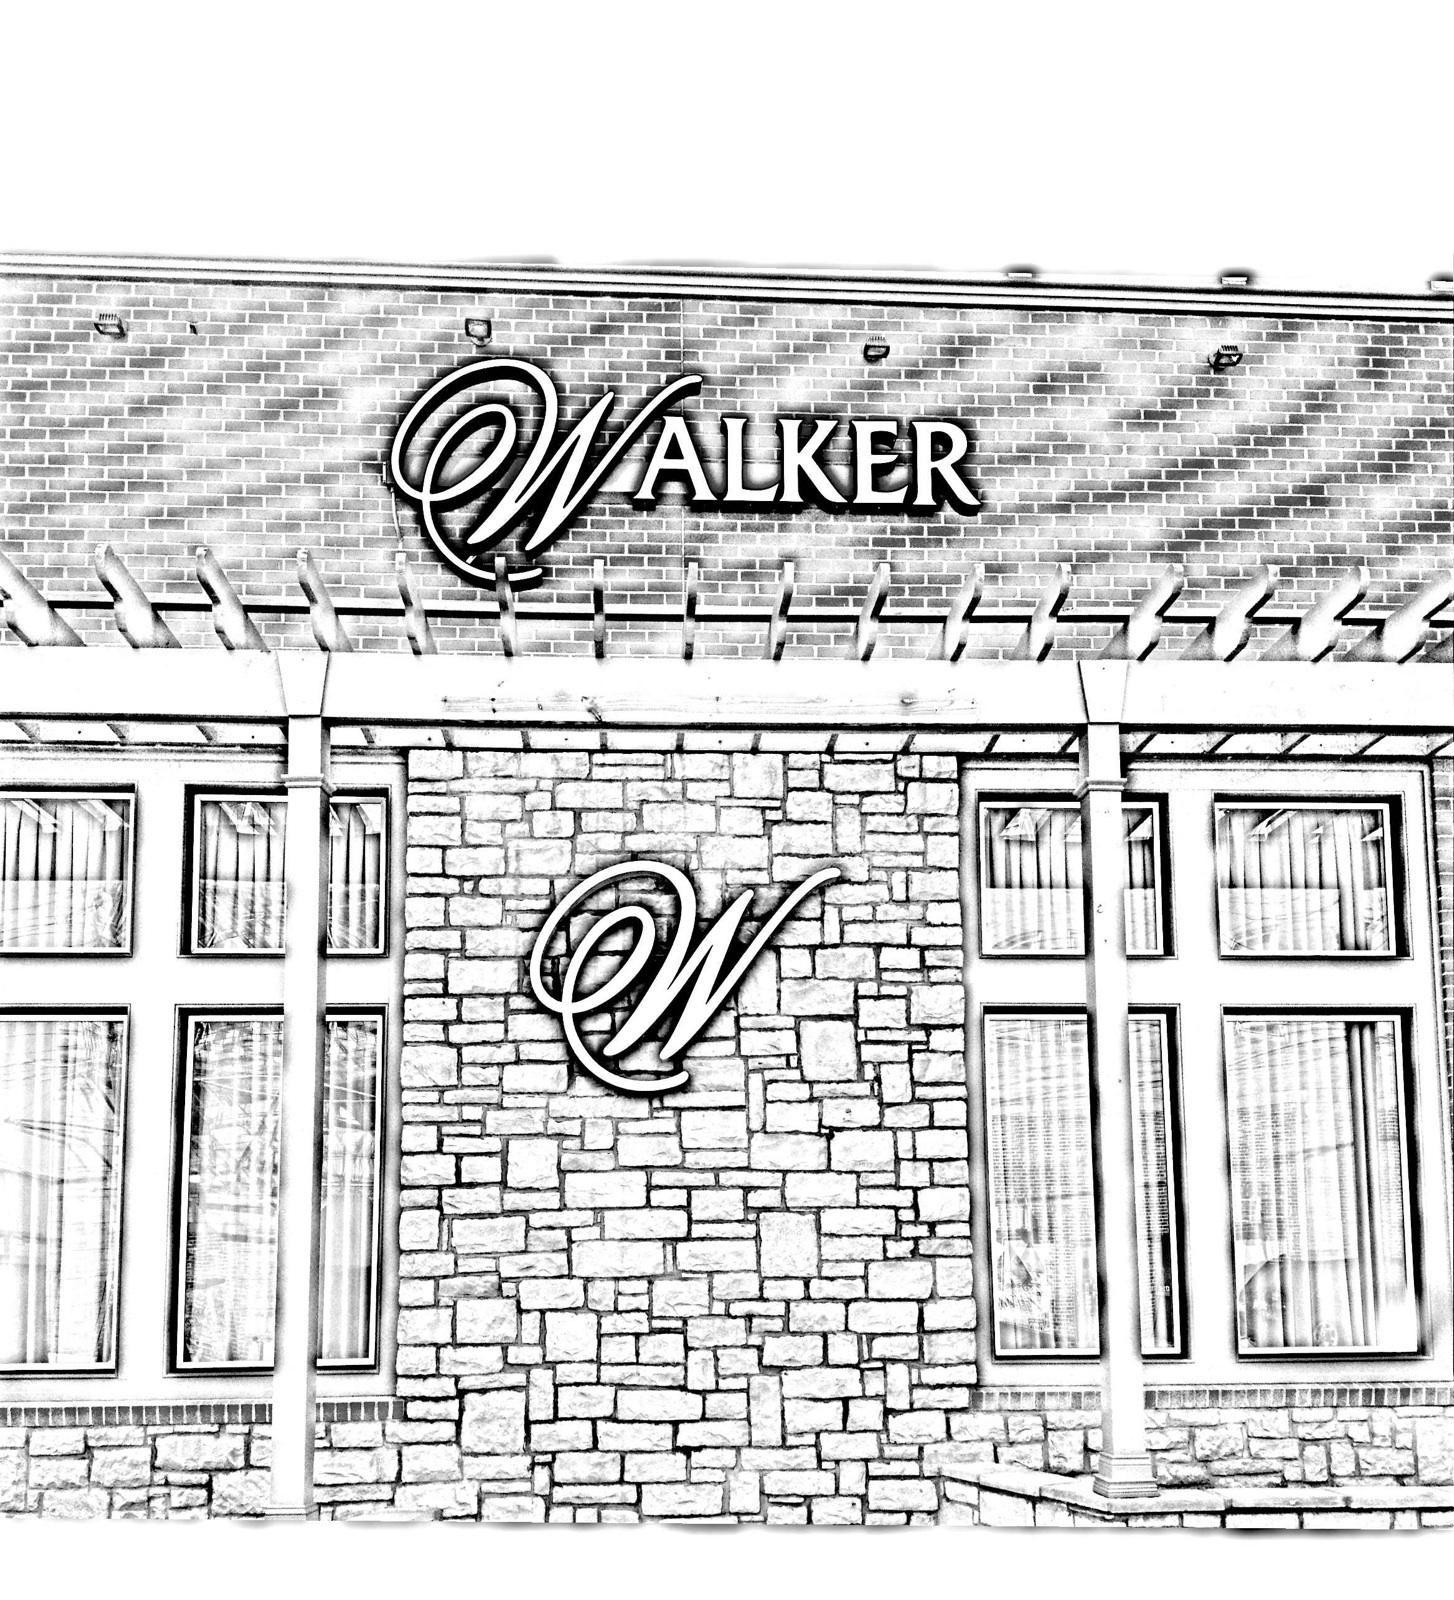 Walker Funeral Home Walnut Hills Chapel At 1025 E Mcmillan Street Cincinnati 45206 Www Herbwalker Com Call 513 25 Funeral Home Funeral Downtown Cincinnati